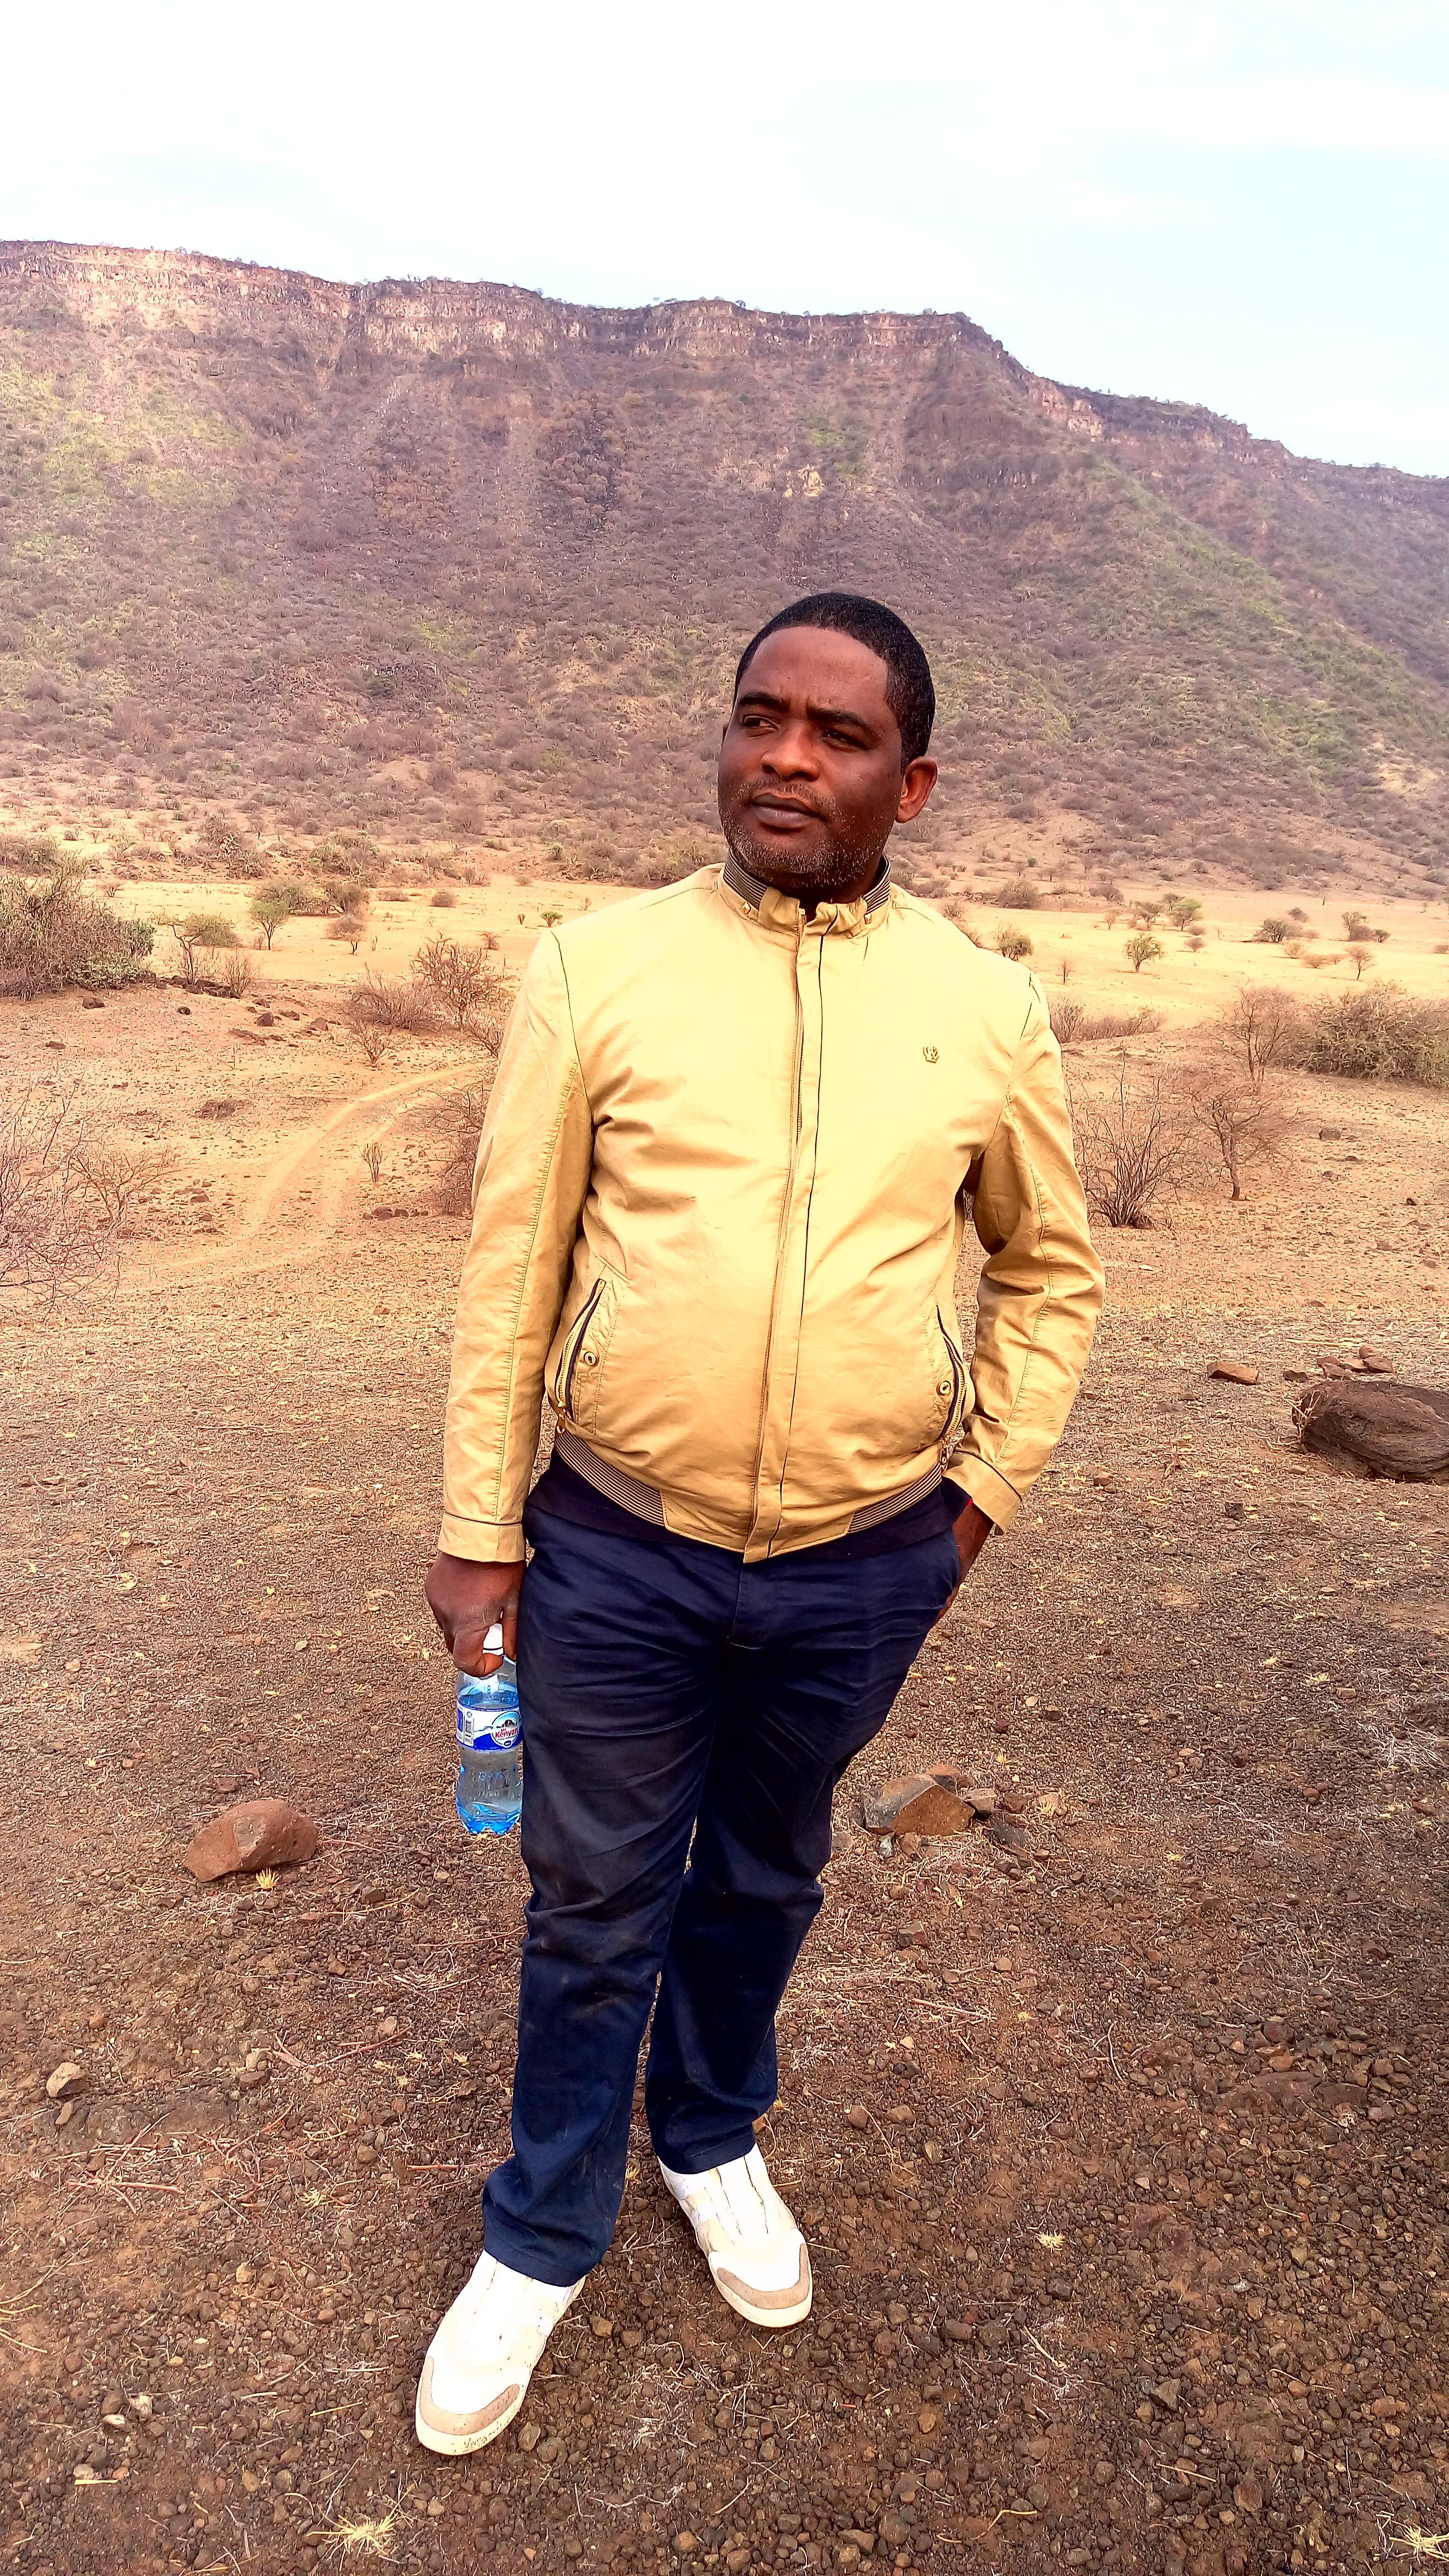 Emmanuel Igbaukum